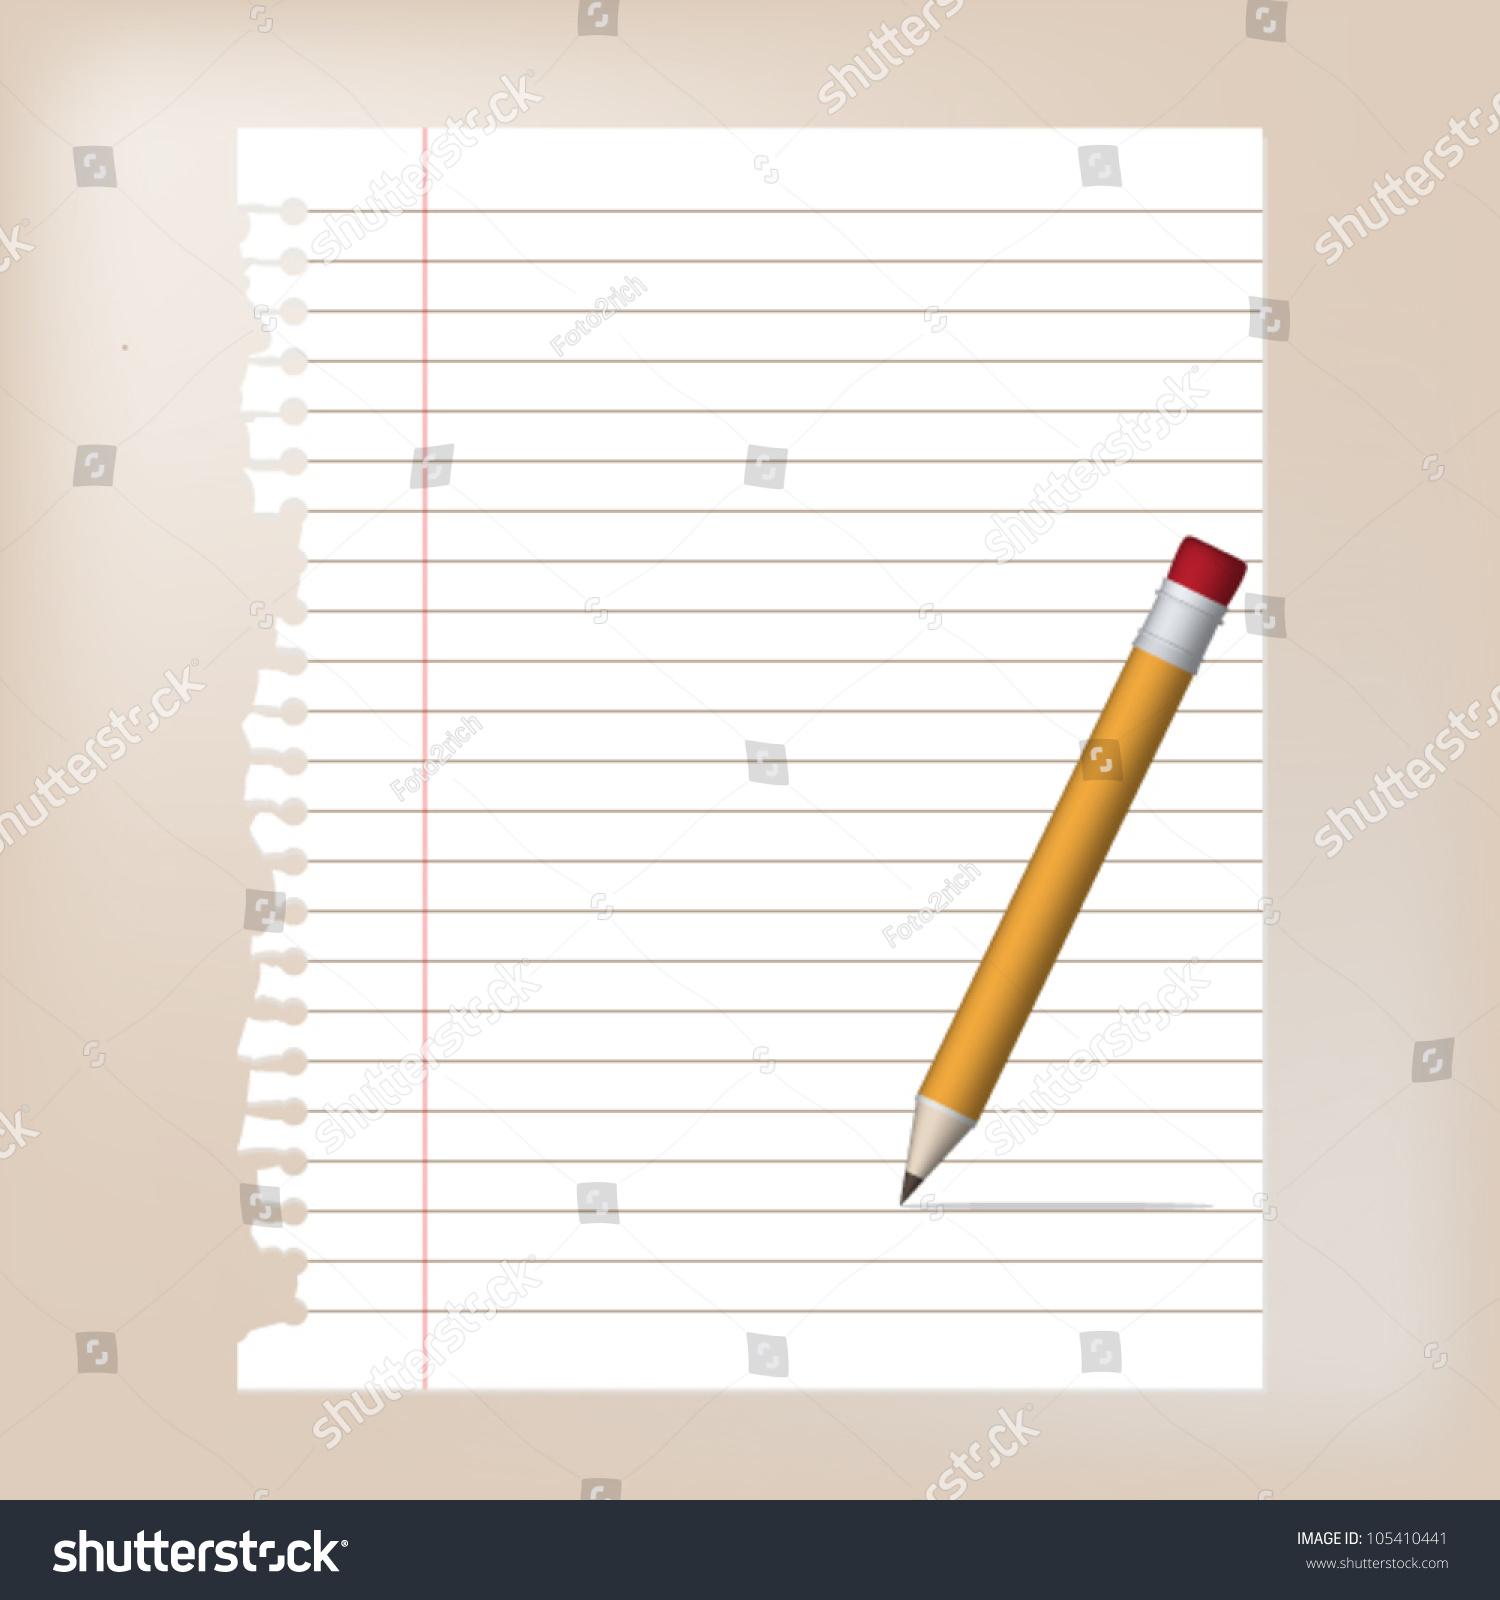 act essay pen pencil